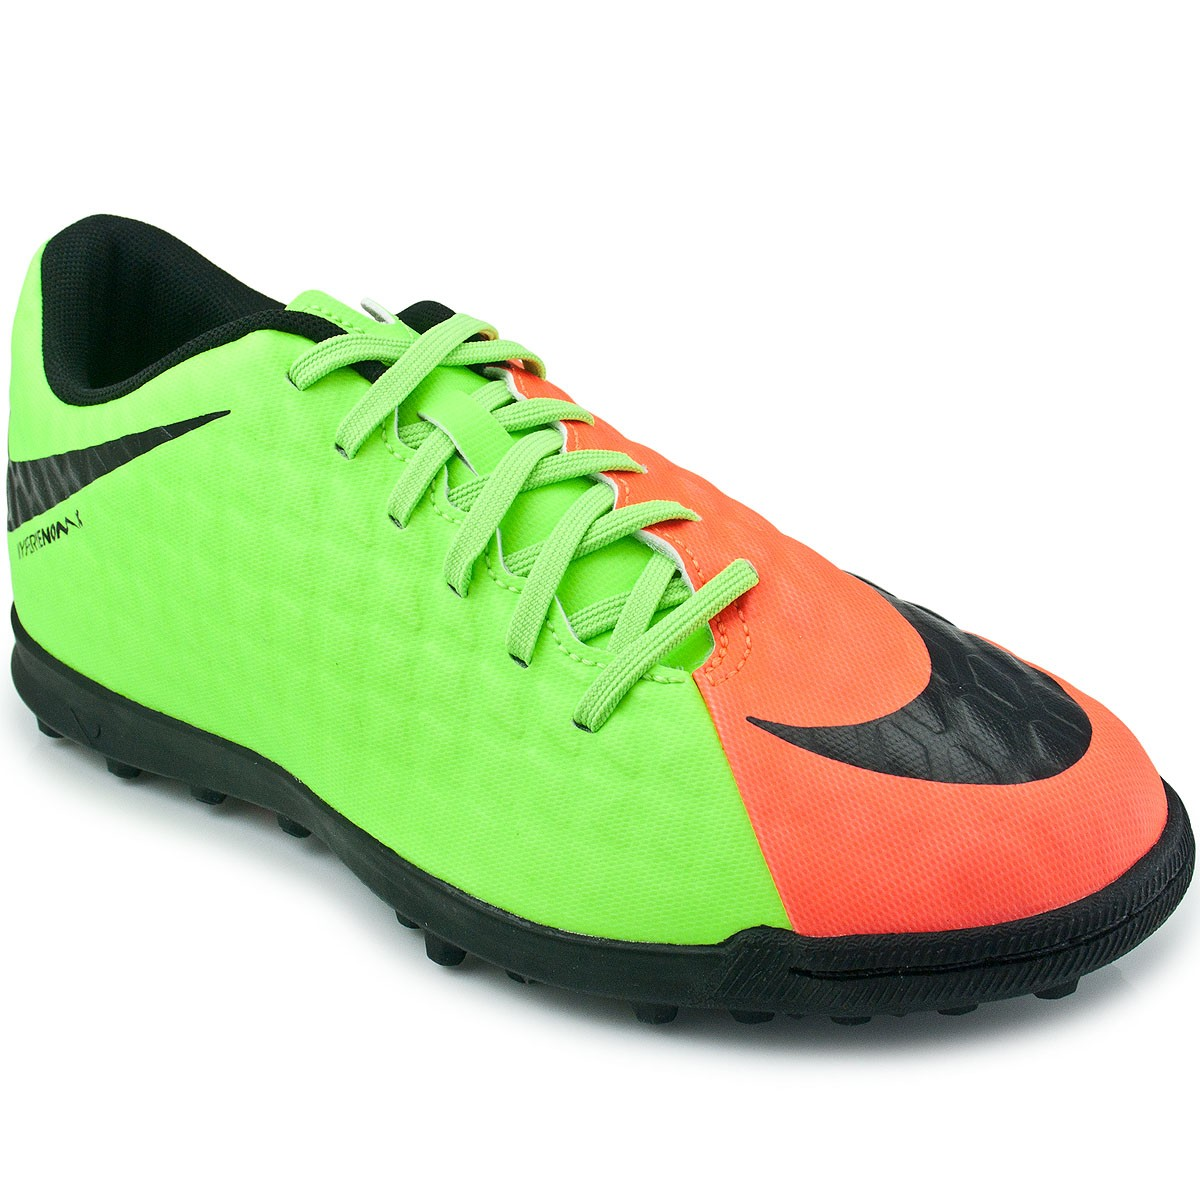 Chuteira Nike Hypervenom Phade III TF  7f2fb0e832296